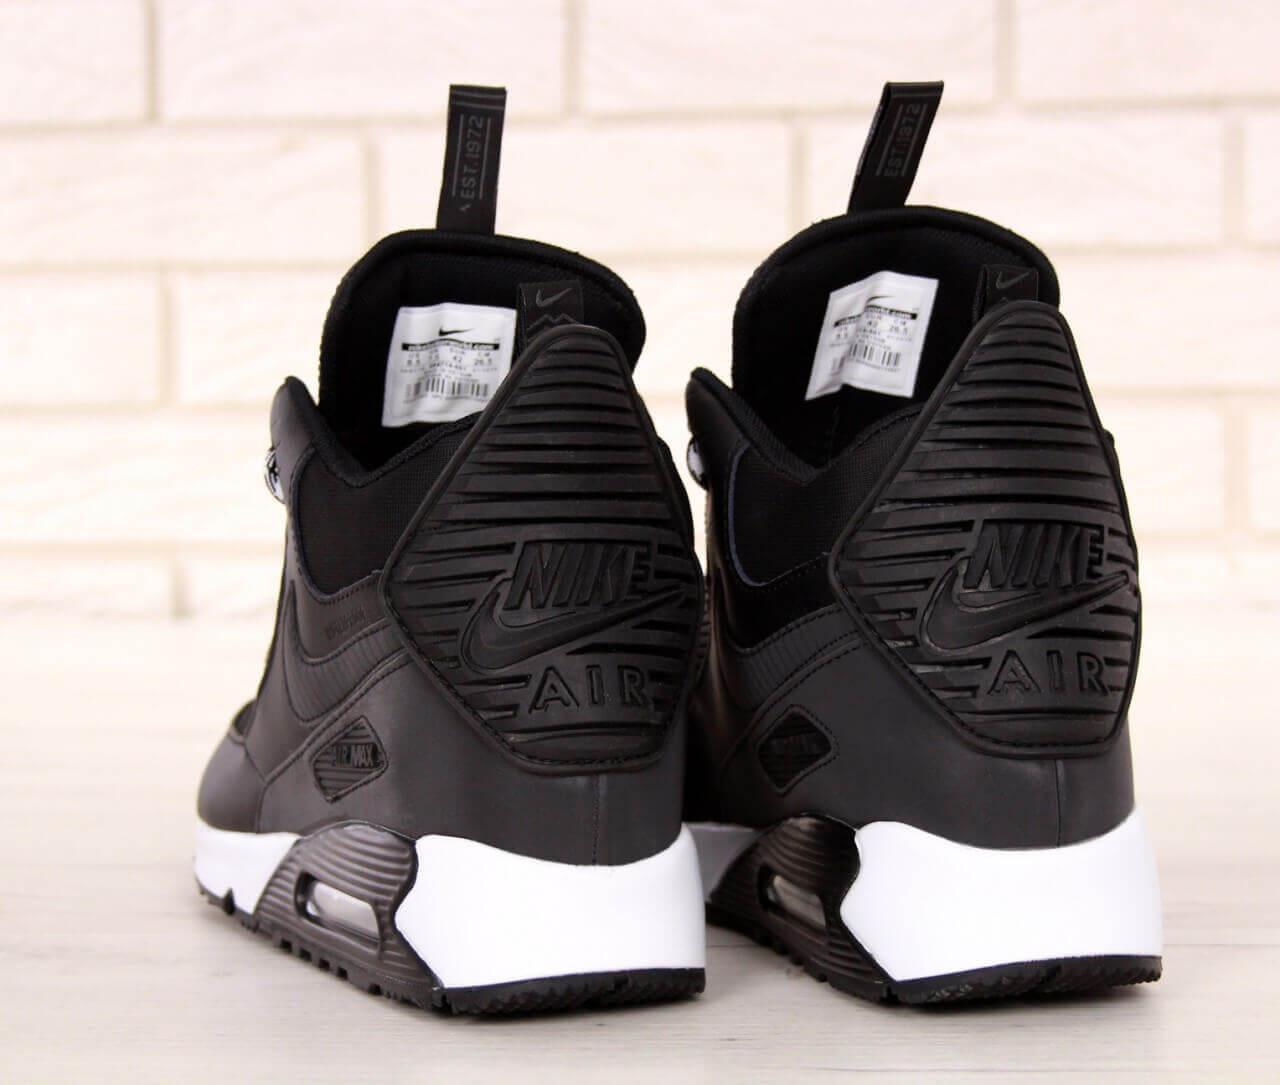 0ec51f08 Зимние мужские кроссовки Nike Air Max 90 Sneakerboot Winter Black ...